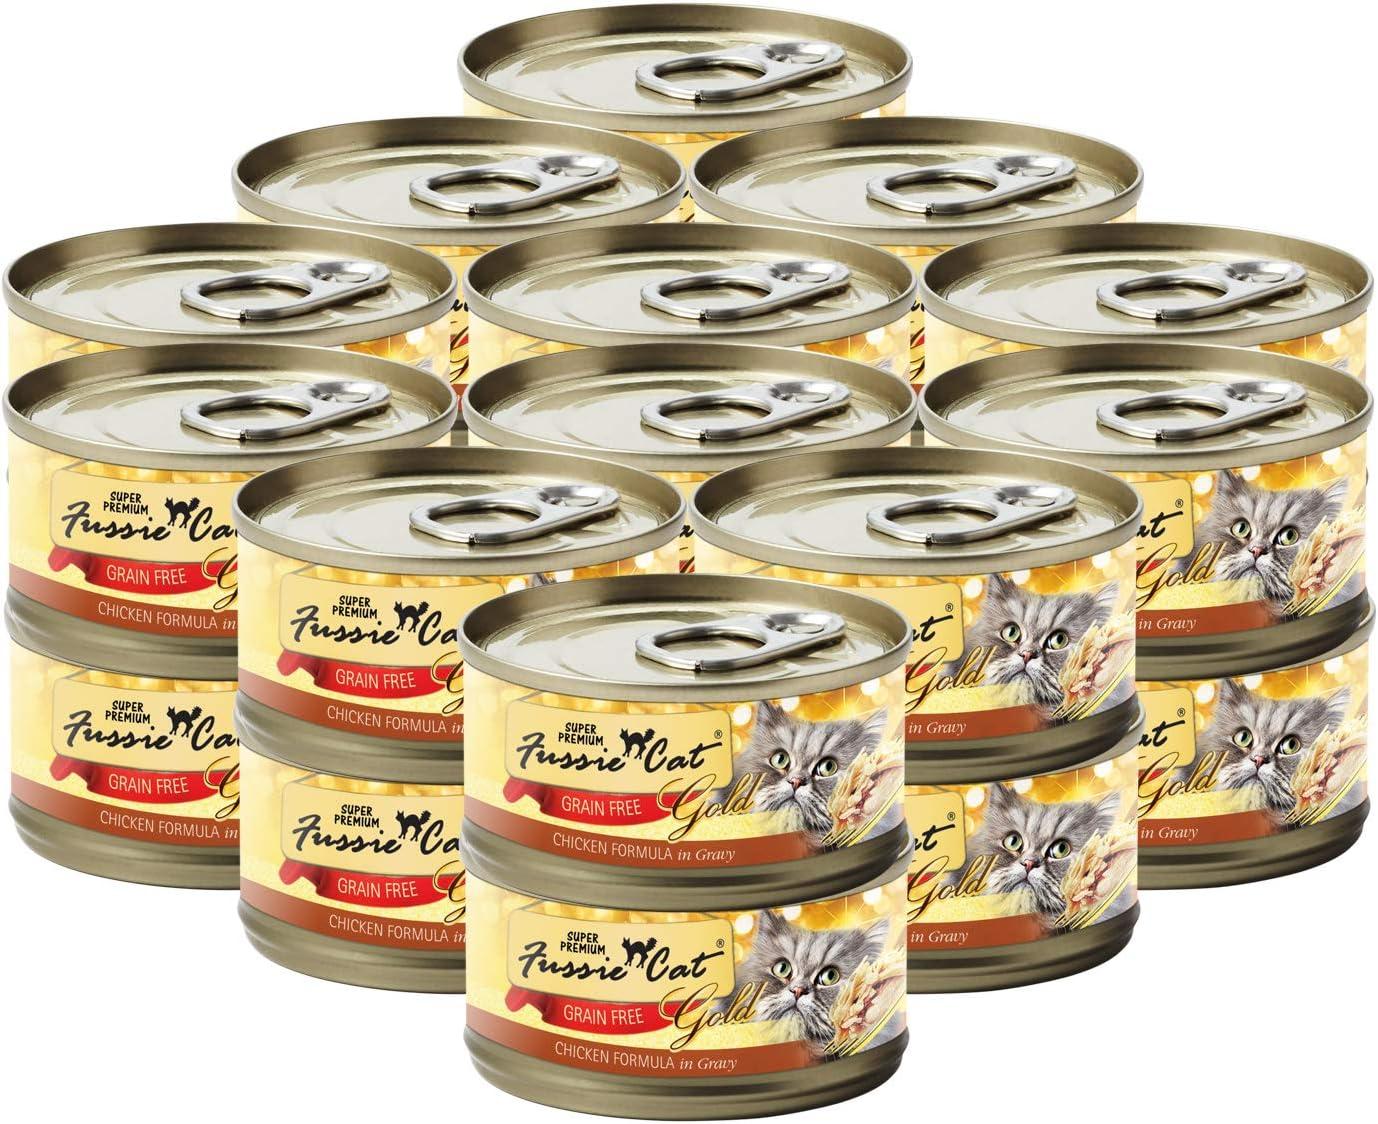 Fussie Cat Super Premium Chicken Formula in Gravy Grain-Free Wet Cat Food 2.82oz, case of 24